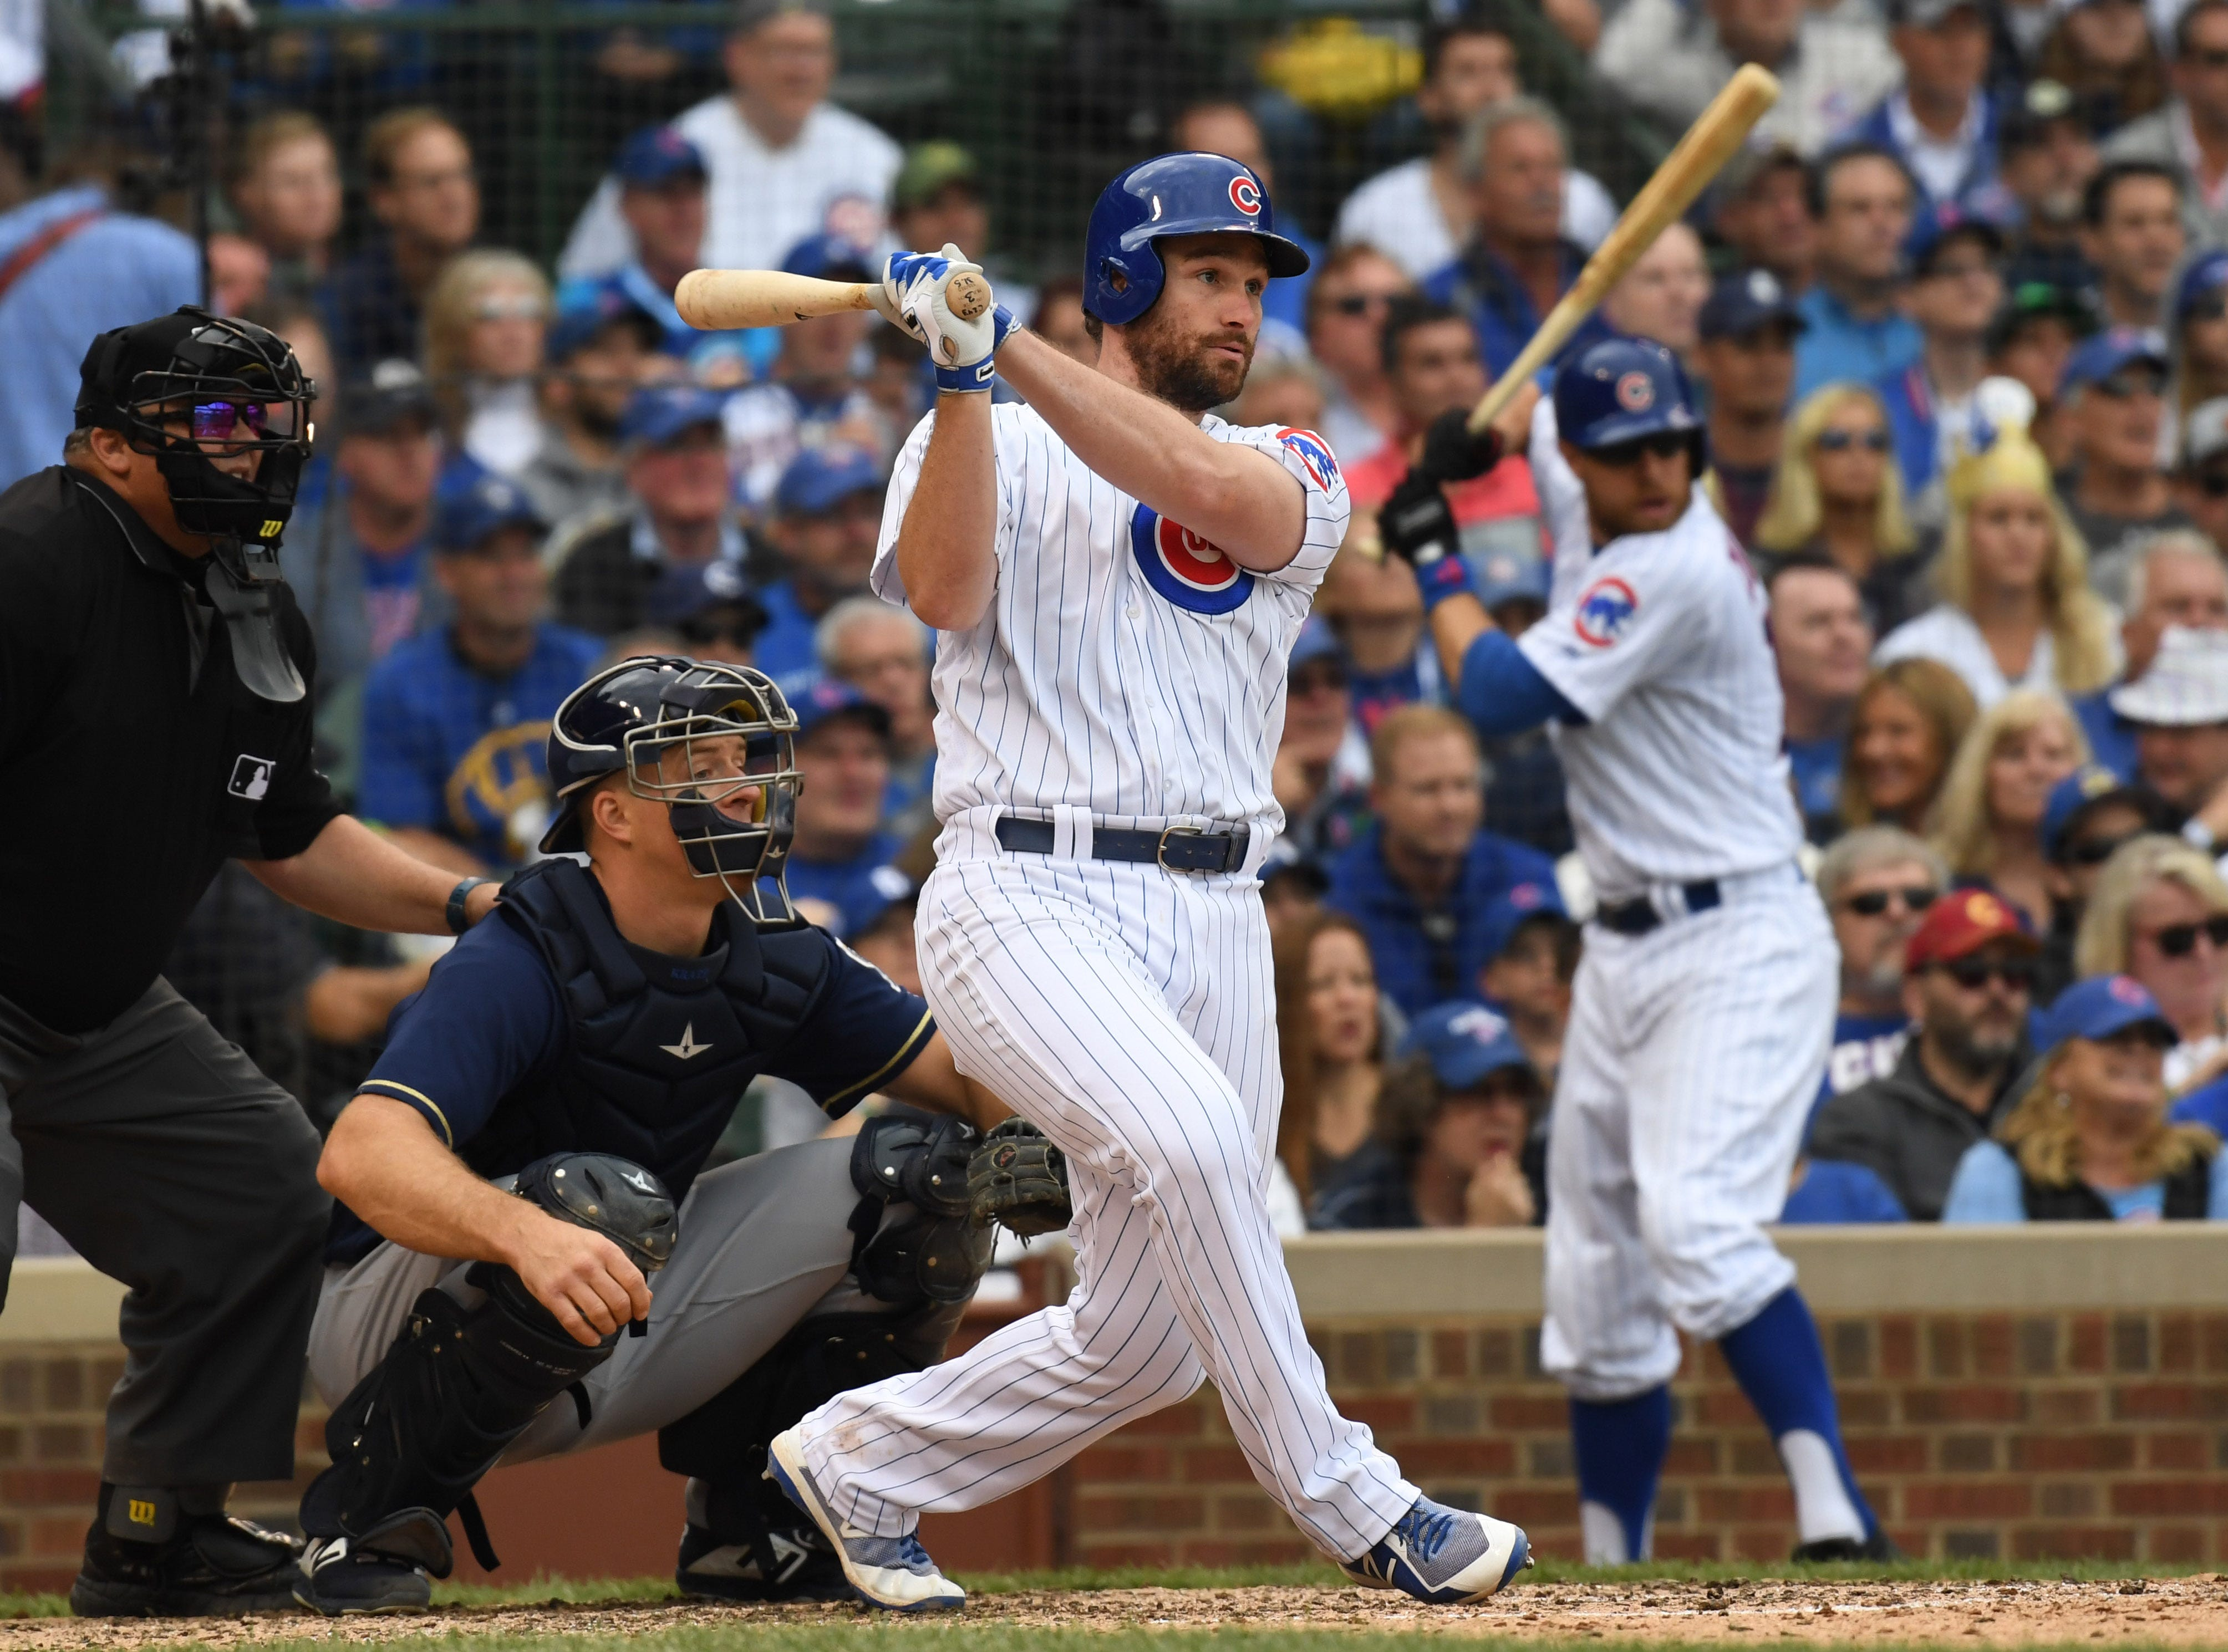 Cubs second baseman Daniel Murphy singles during the sixth inning.